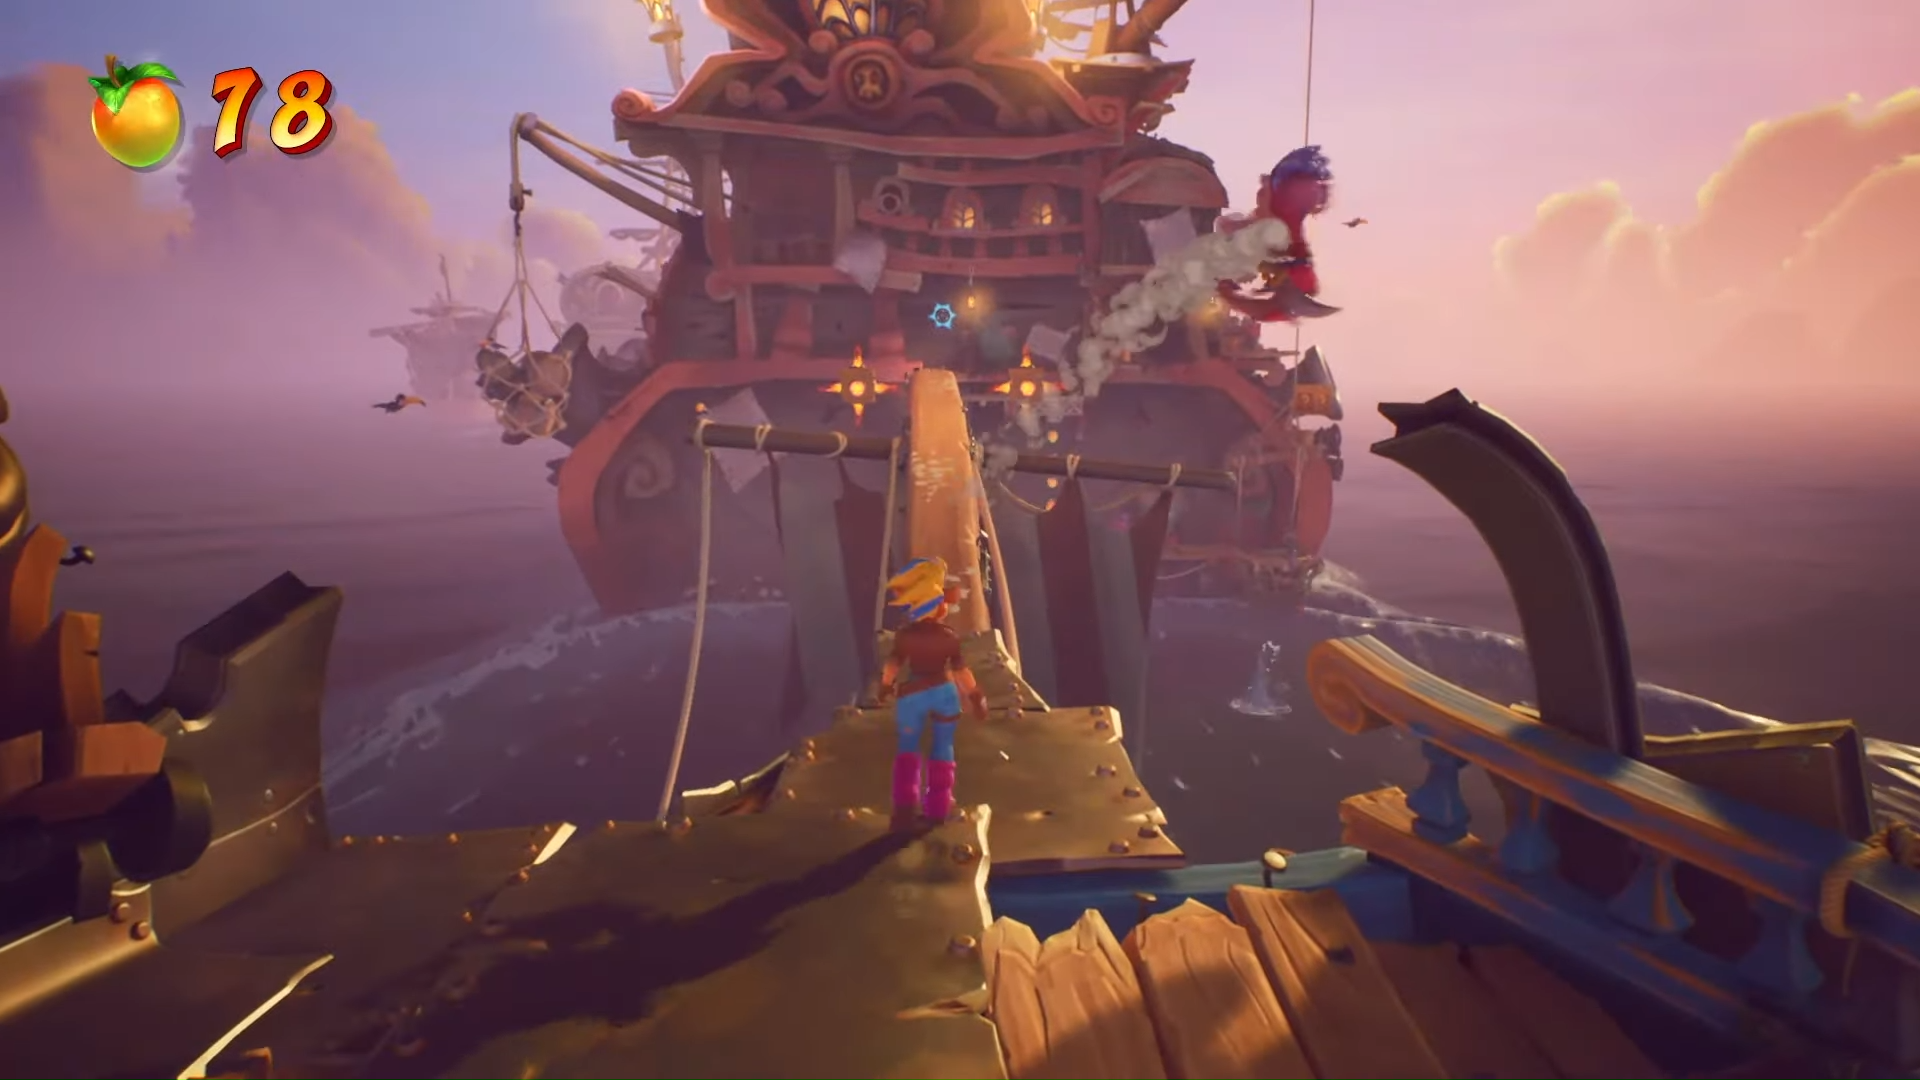 Crash Bandicoot 4: svelato il gameplay di Tawna Bandicoot 2